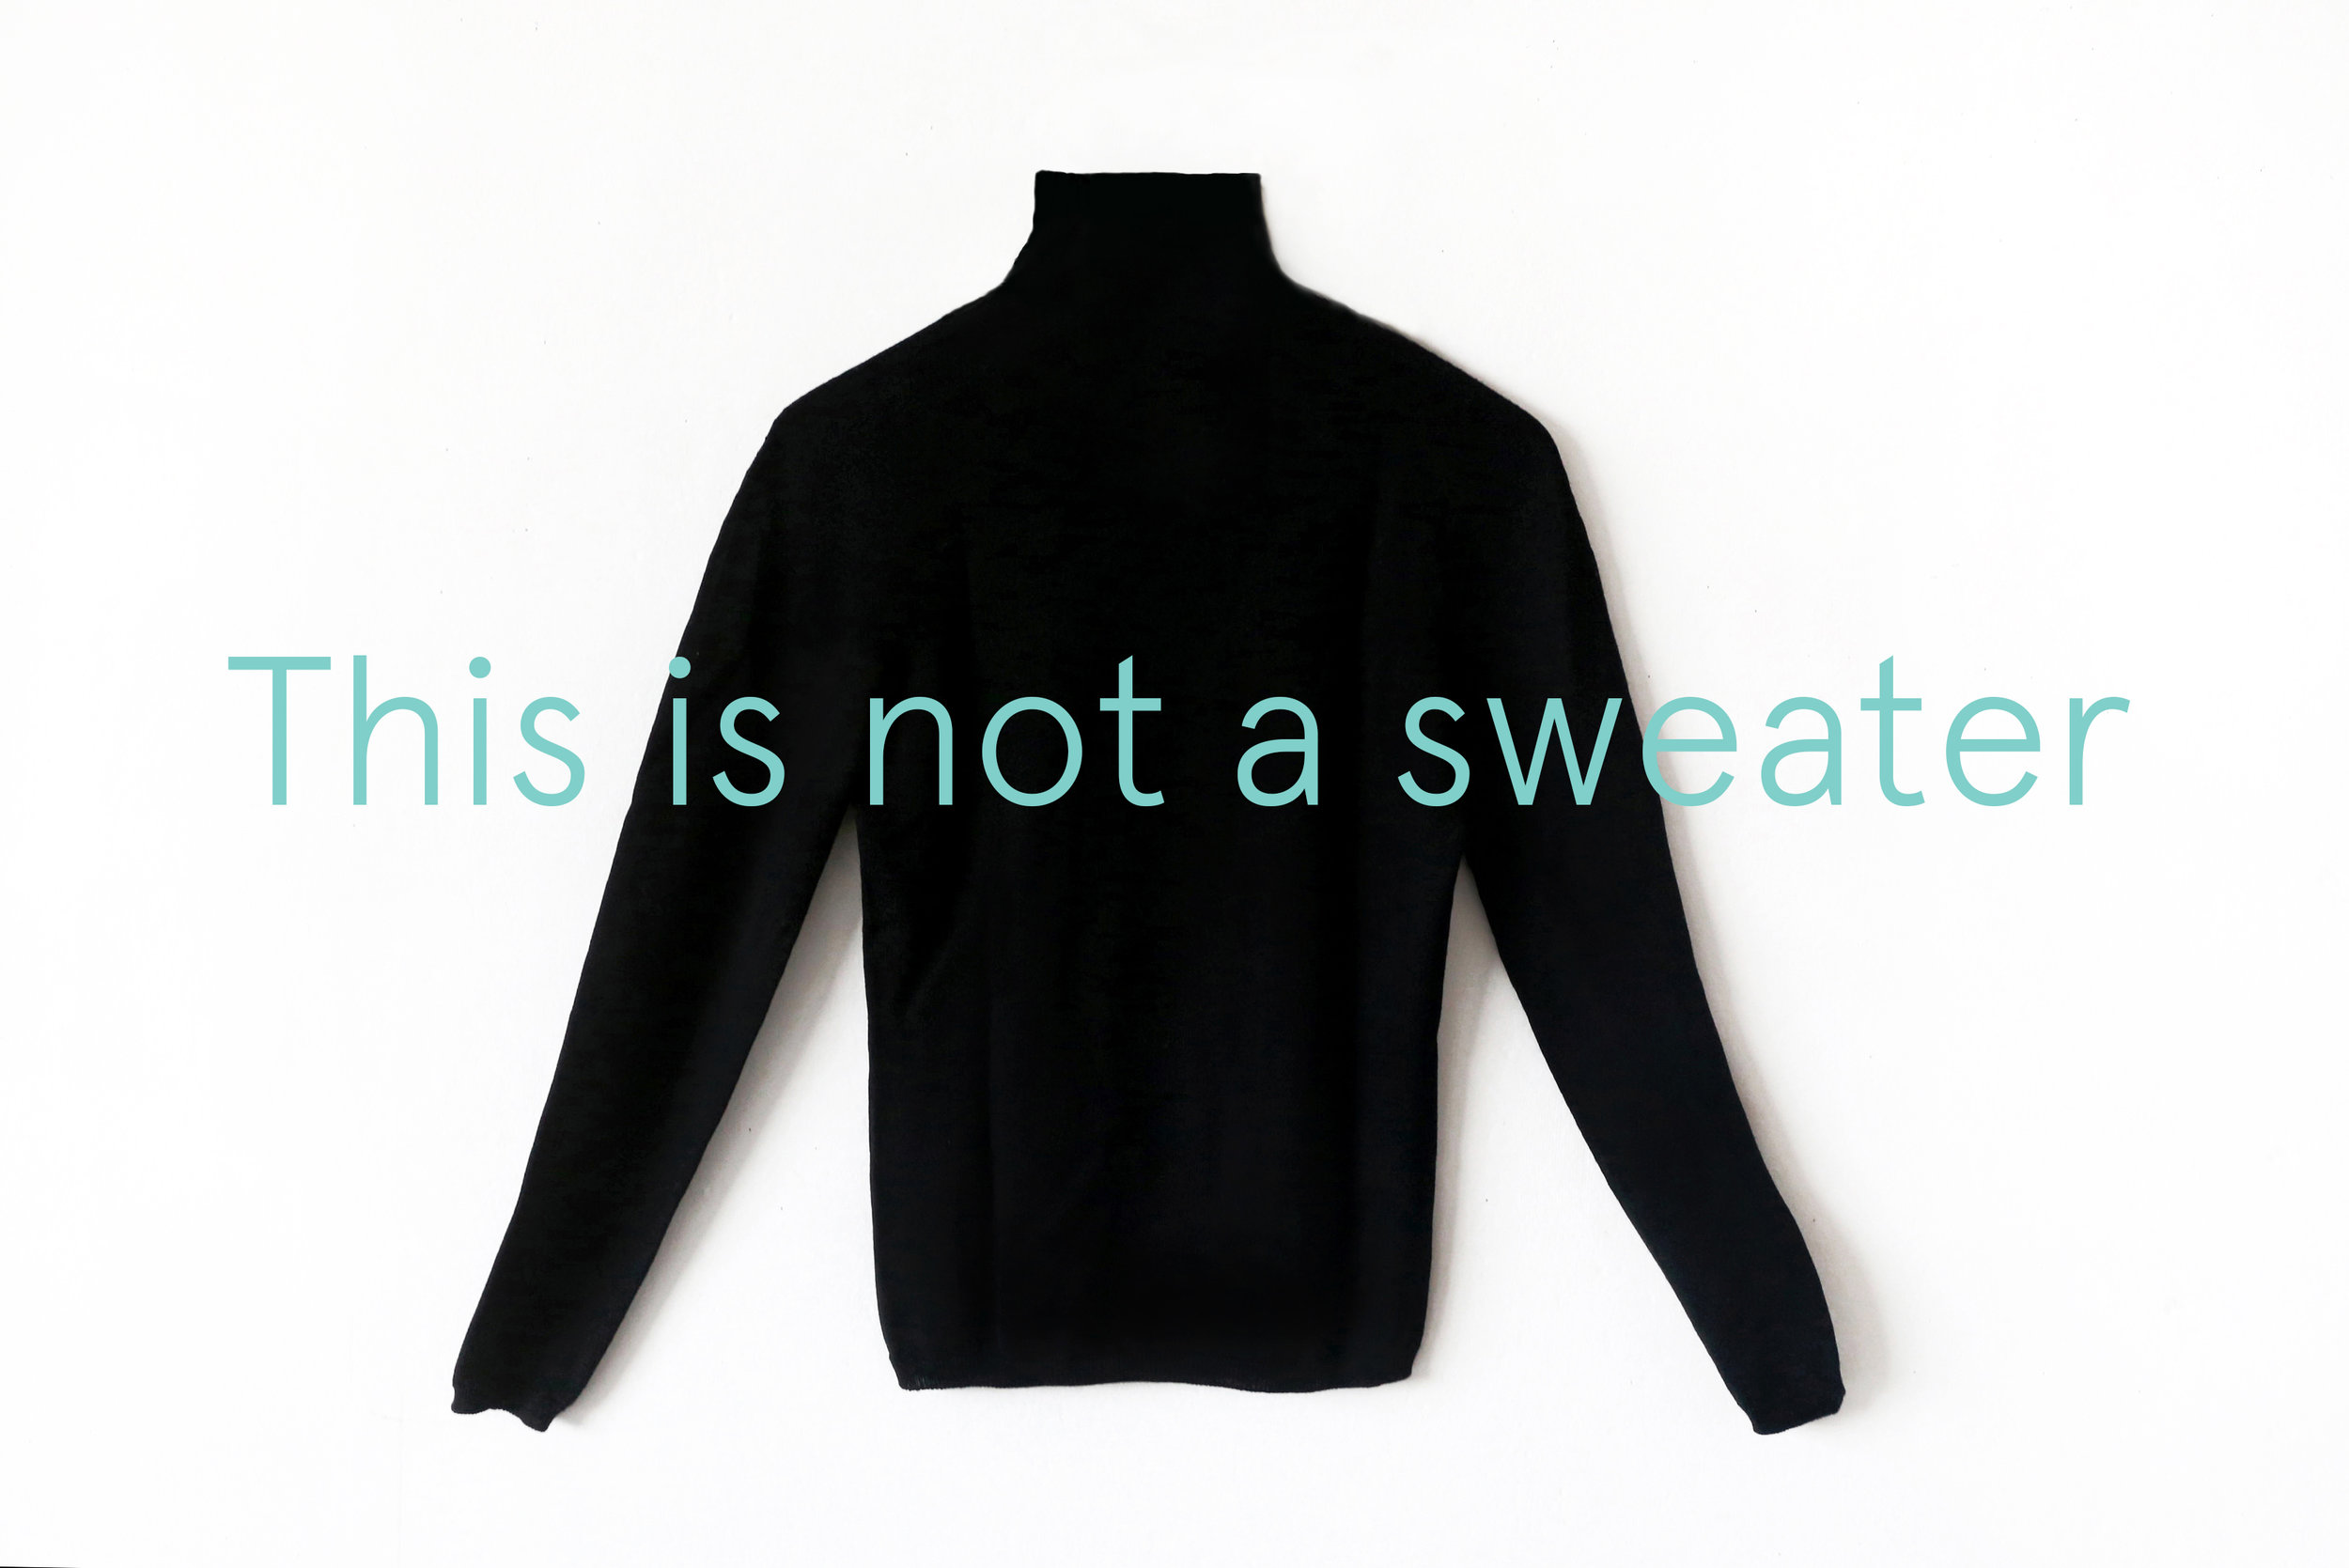 Not A Sweater_english.jpg